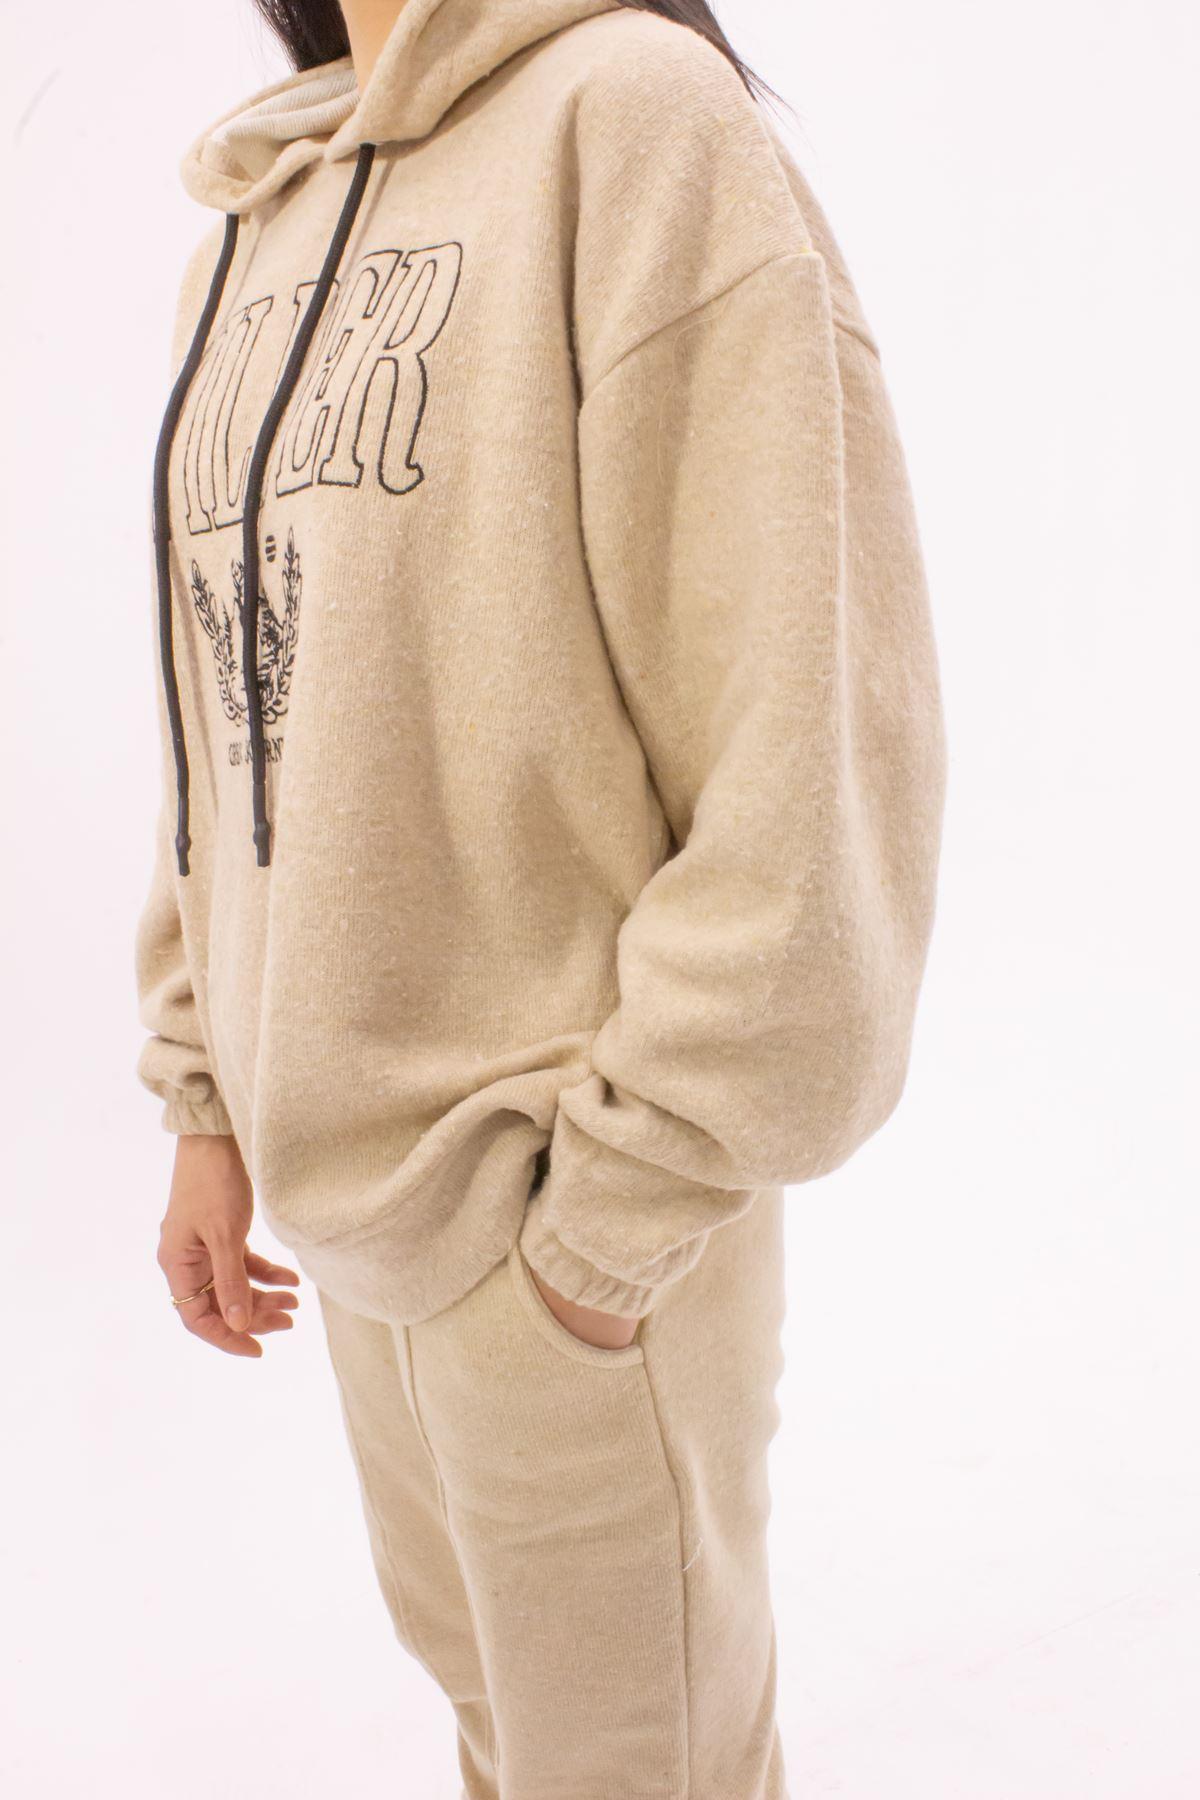 Orjinal Marka Zara Eşofman Takımı